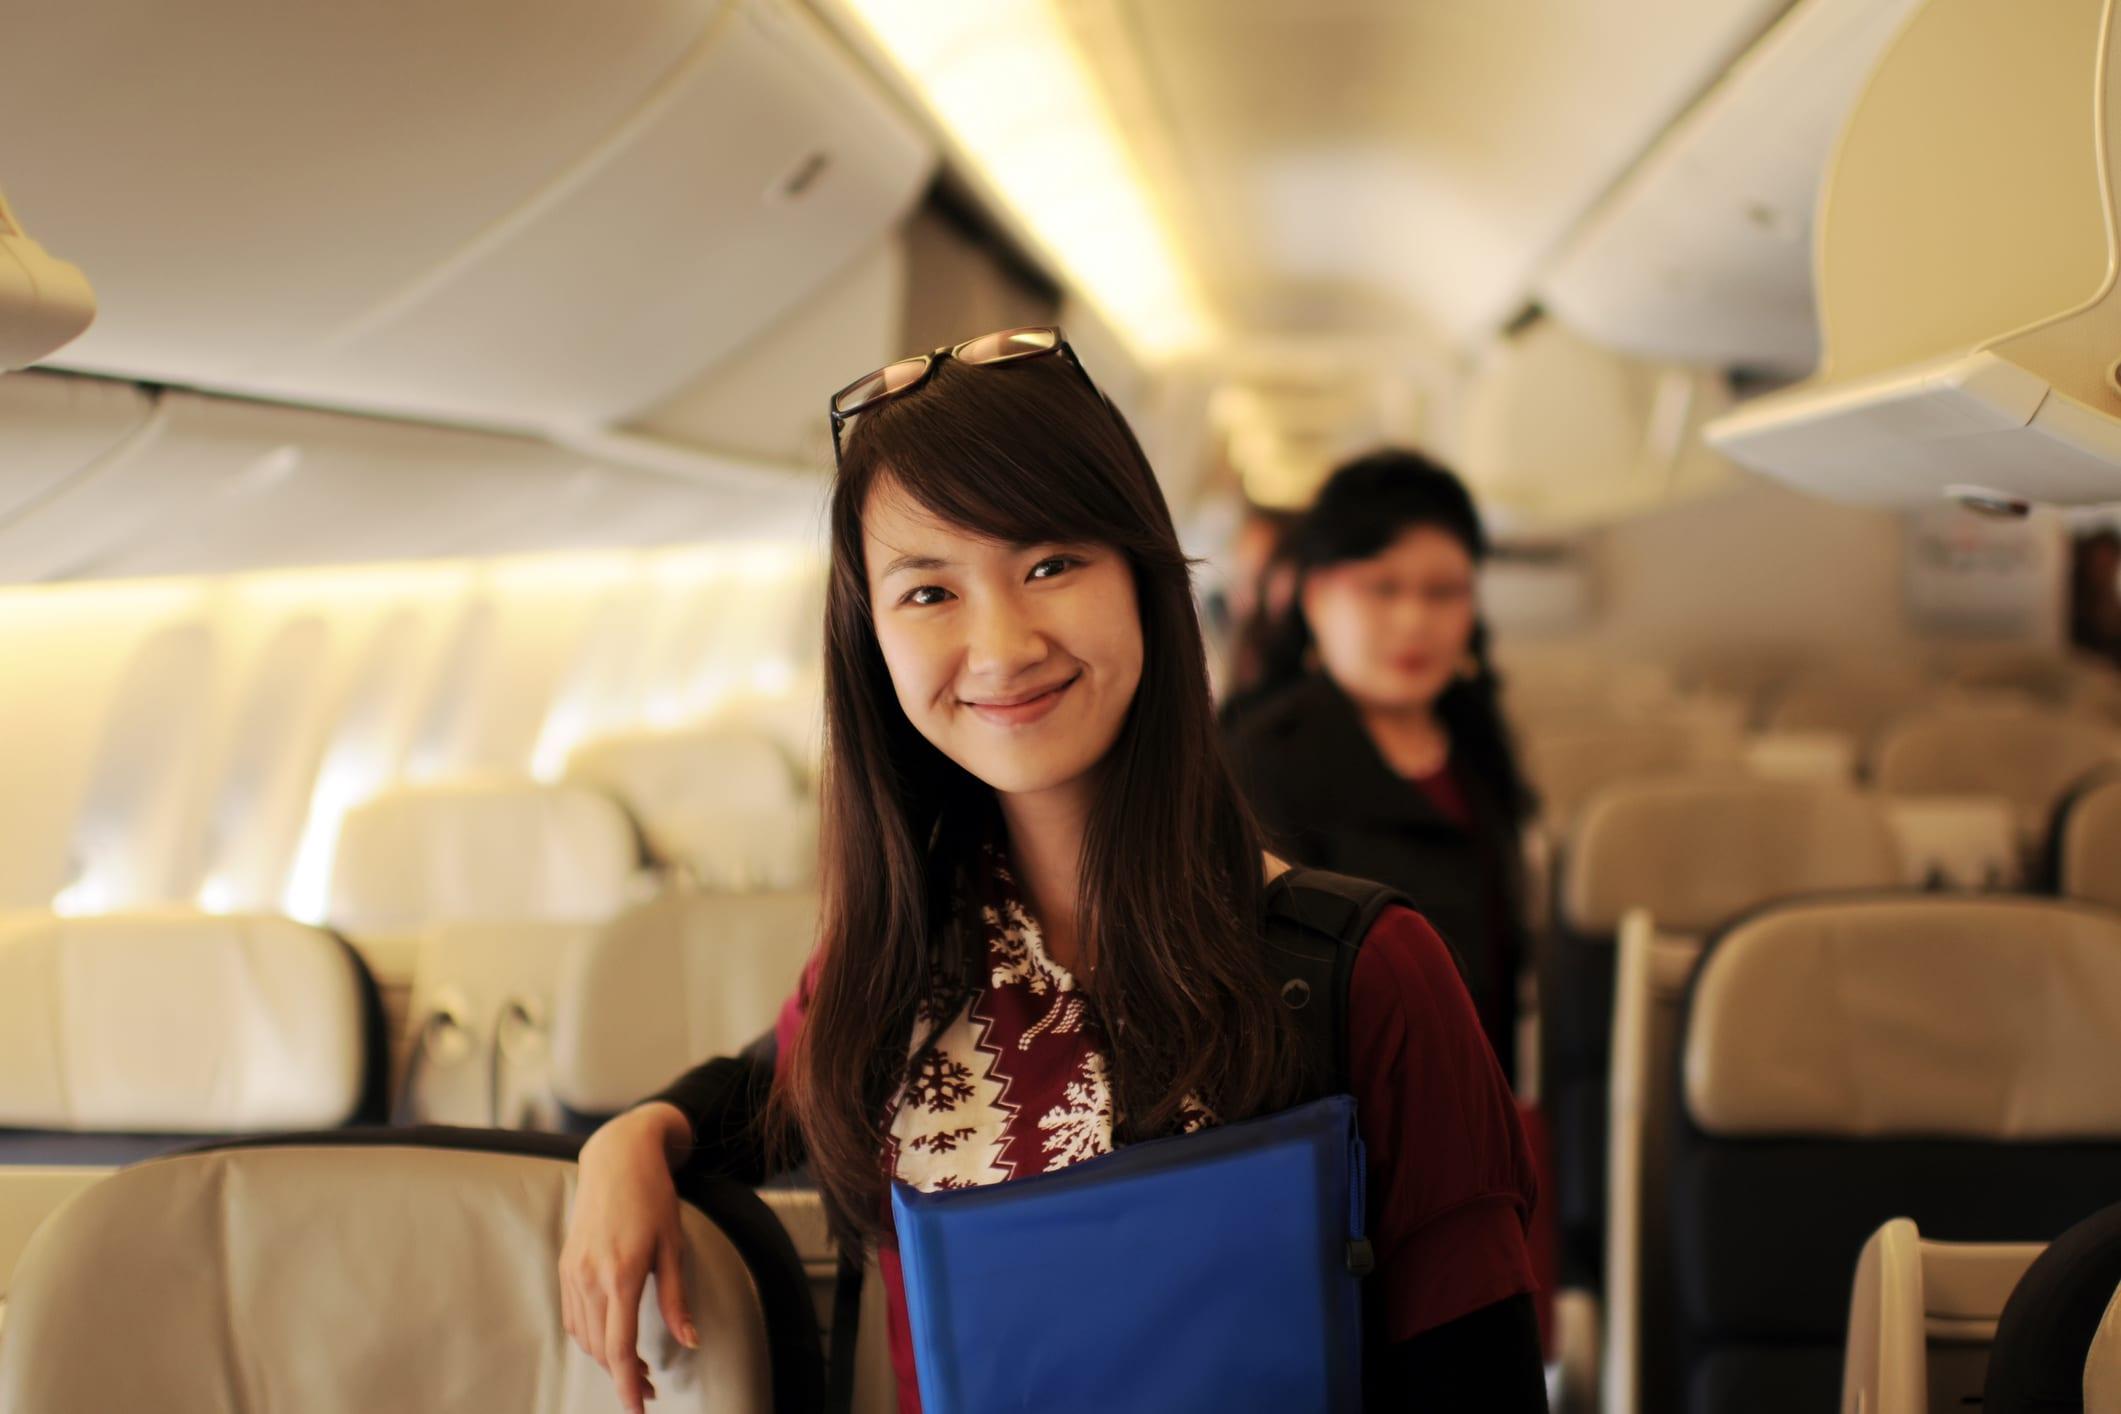 Woman Walking Down an Airplane Aisle